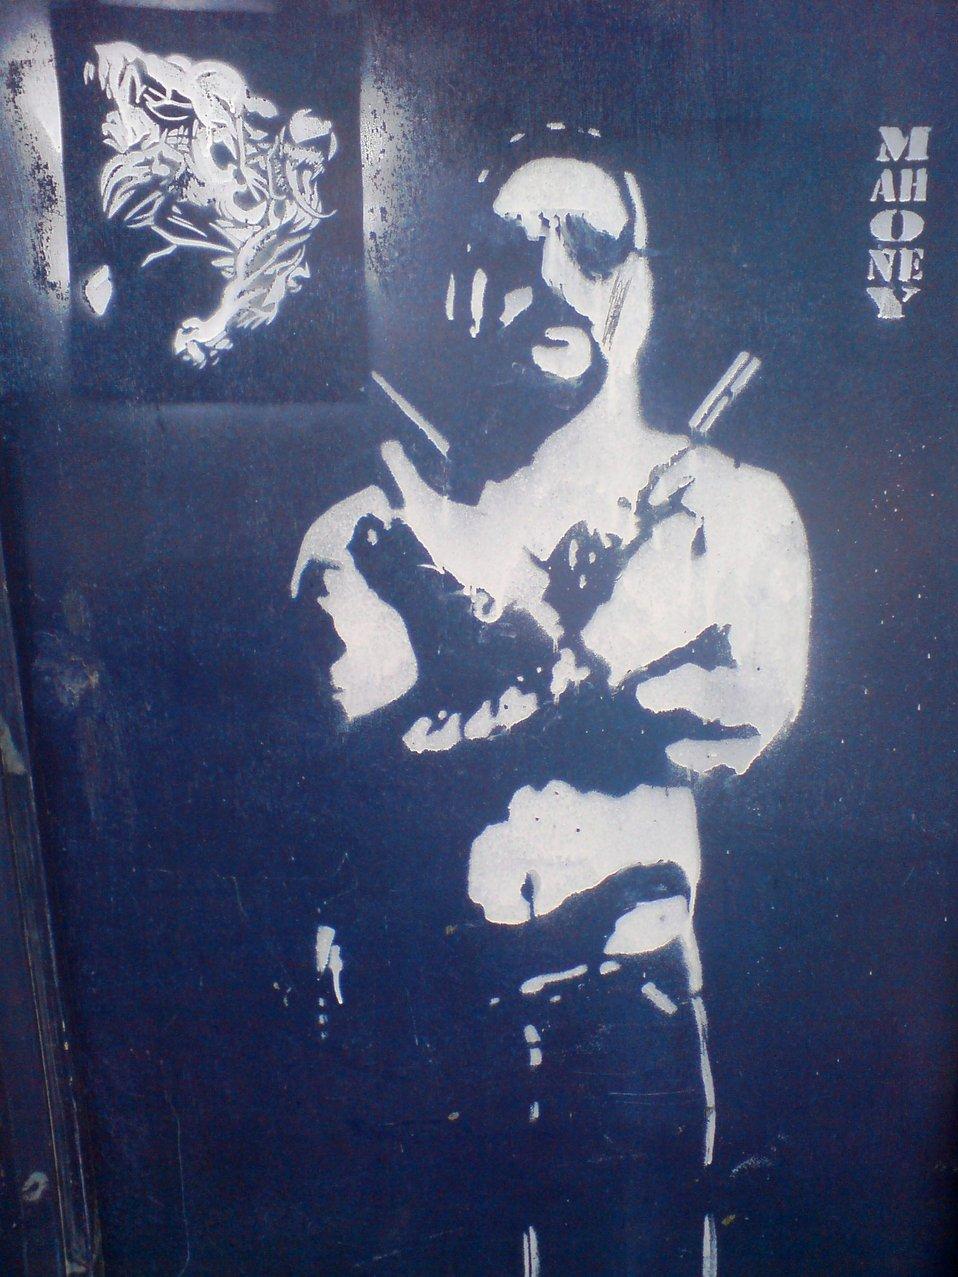 'Man with guns' graffiti, reproducing the poster of Australian movie Chopper with Eric Bana.